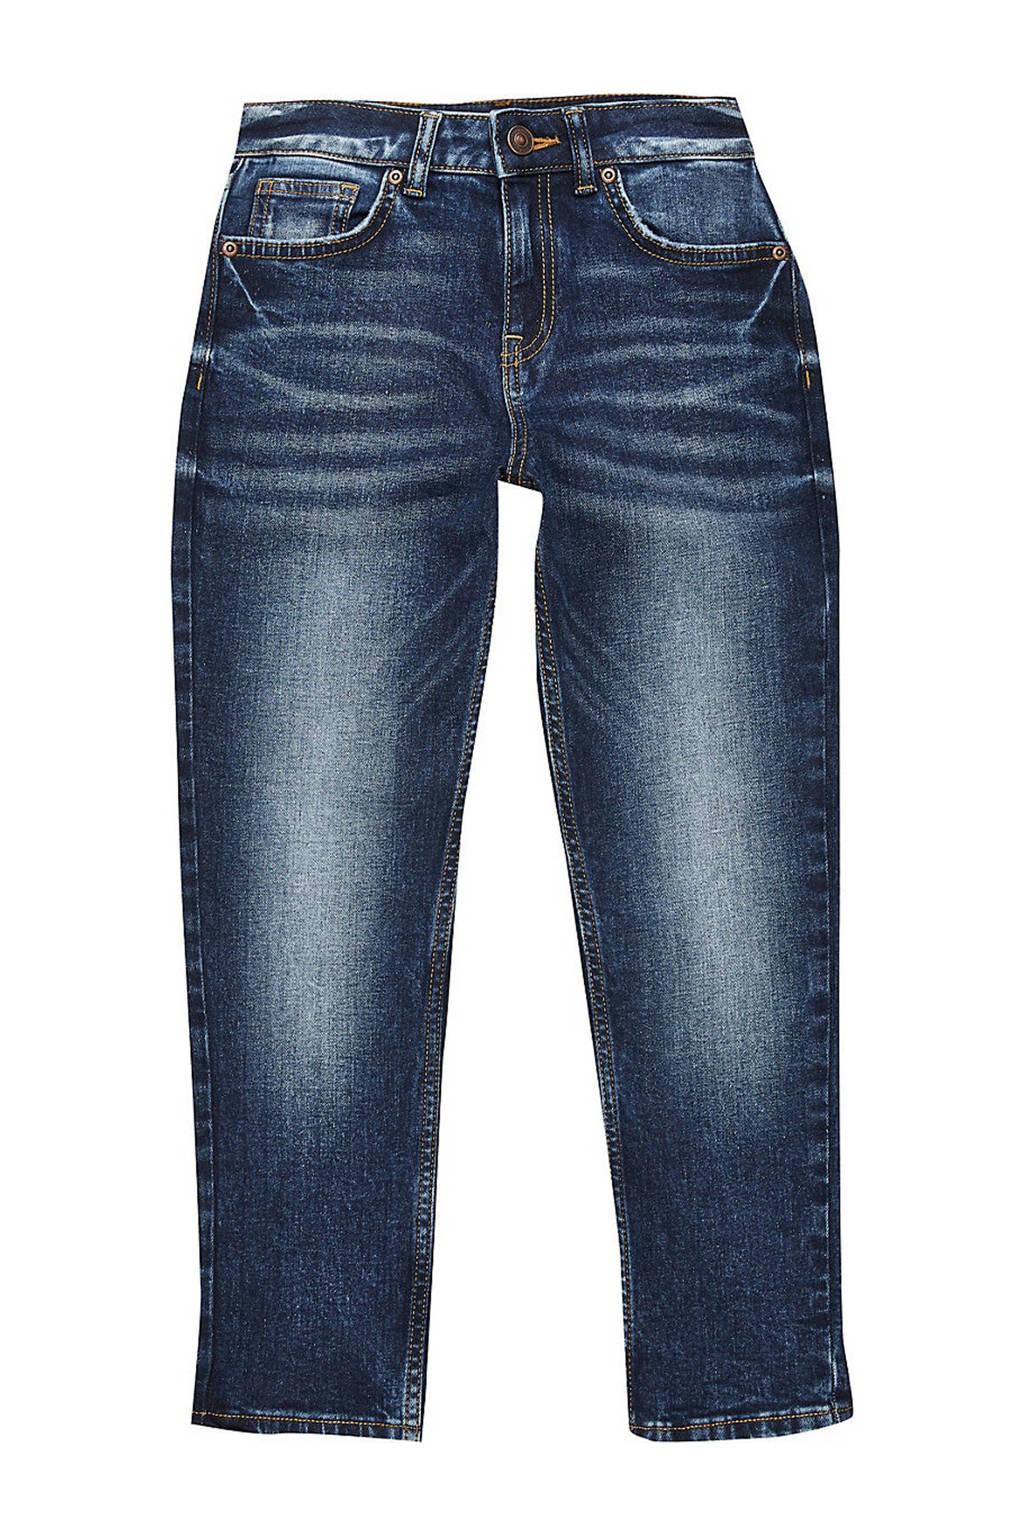 River Island regular fit jeans dark denim, Dark denim